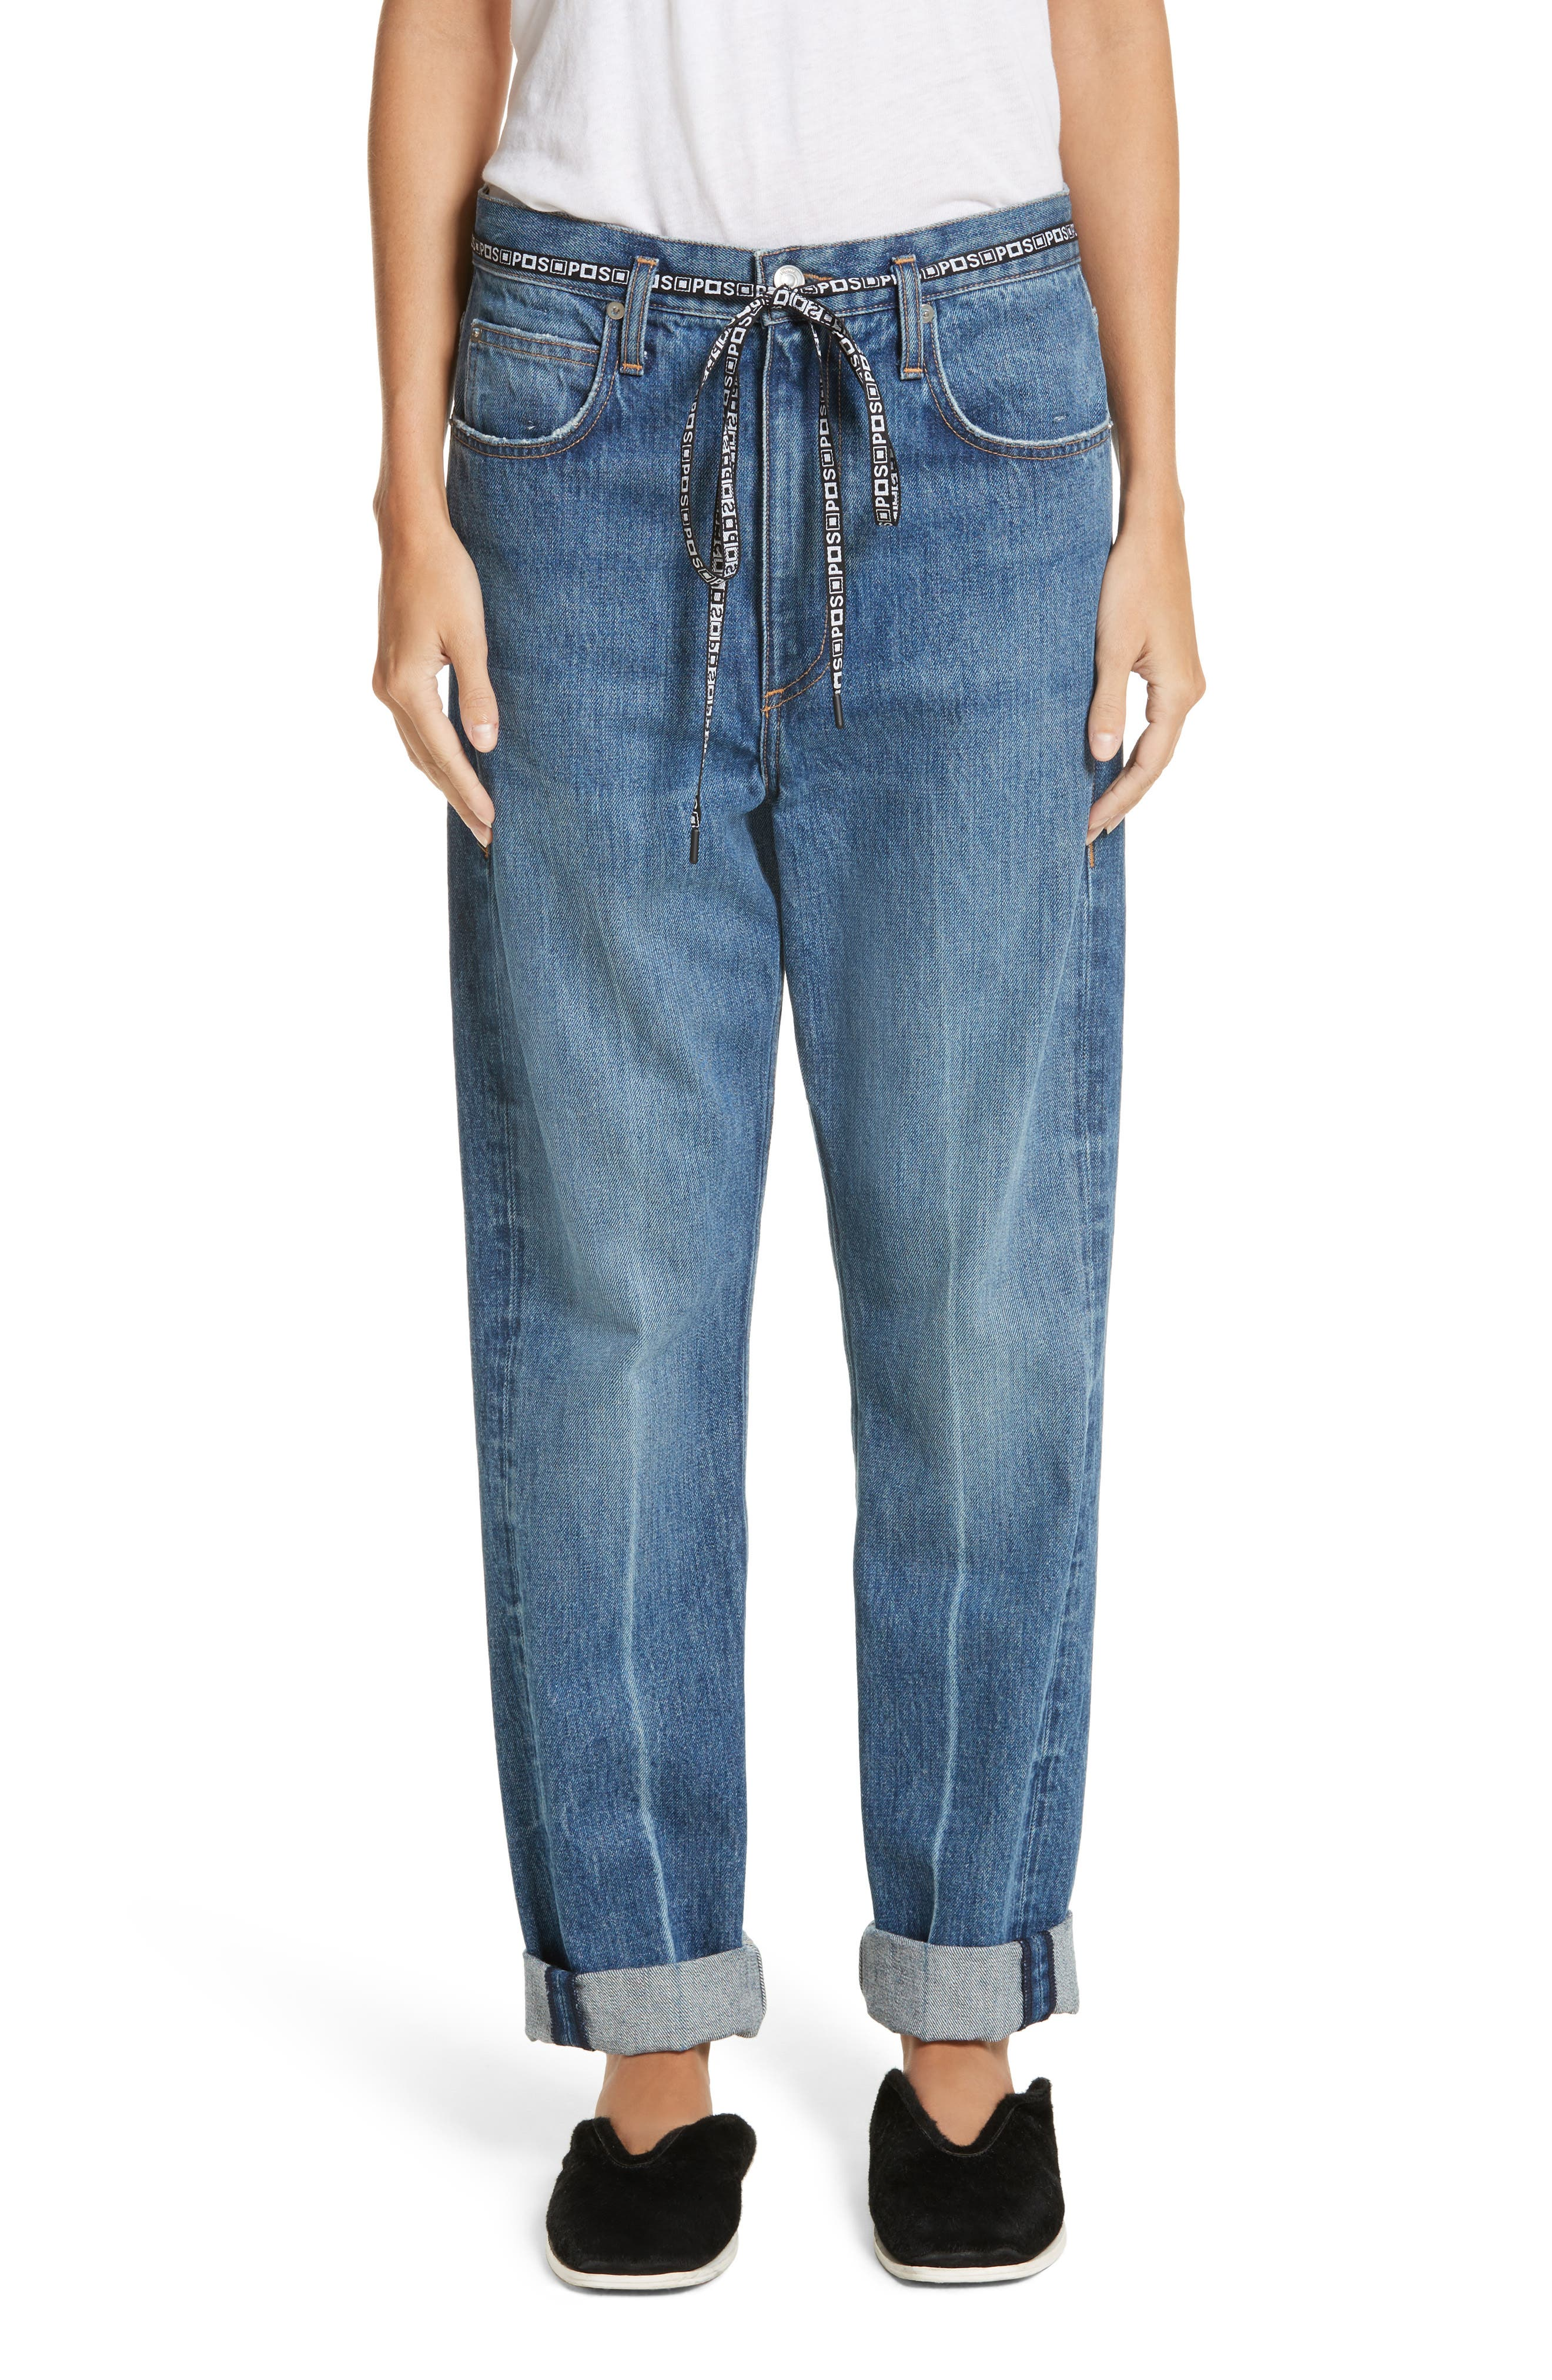 Proenza Schouler PSWL Cuffed Straight Leg Jeans